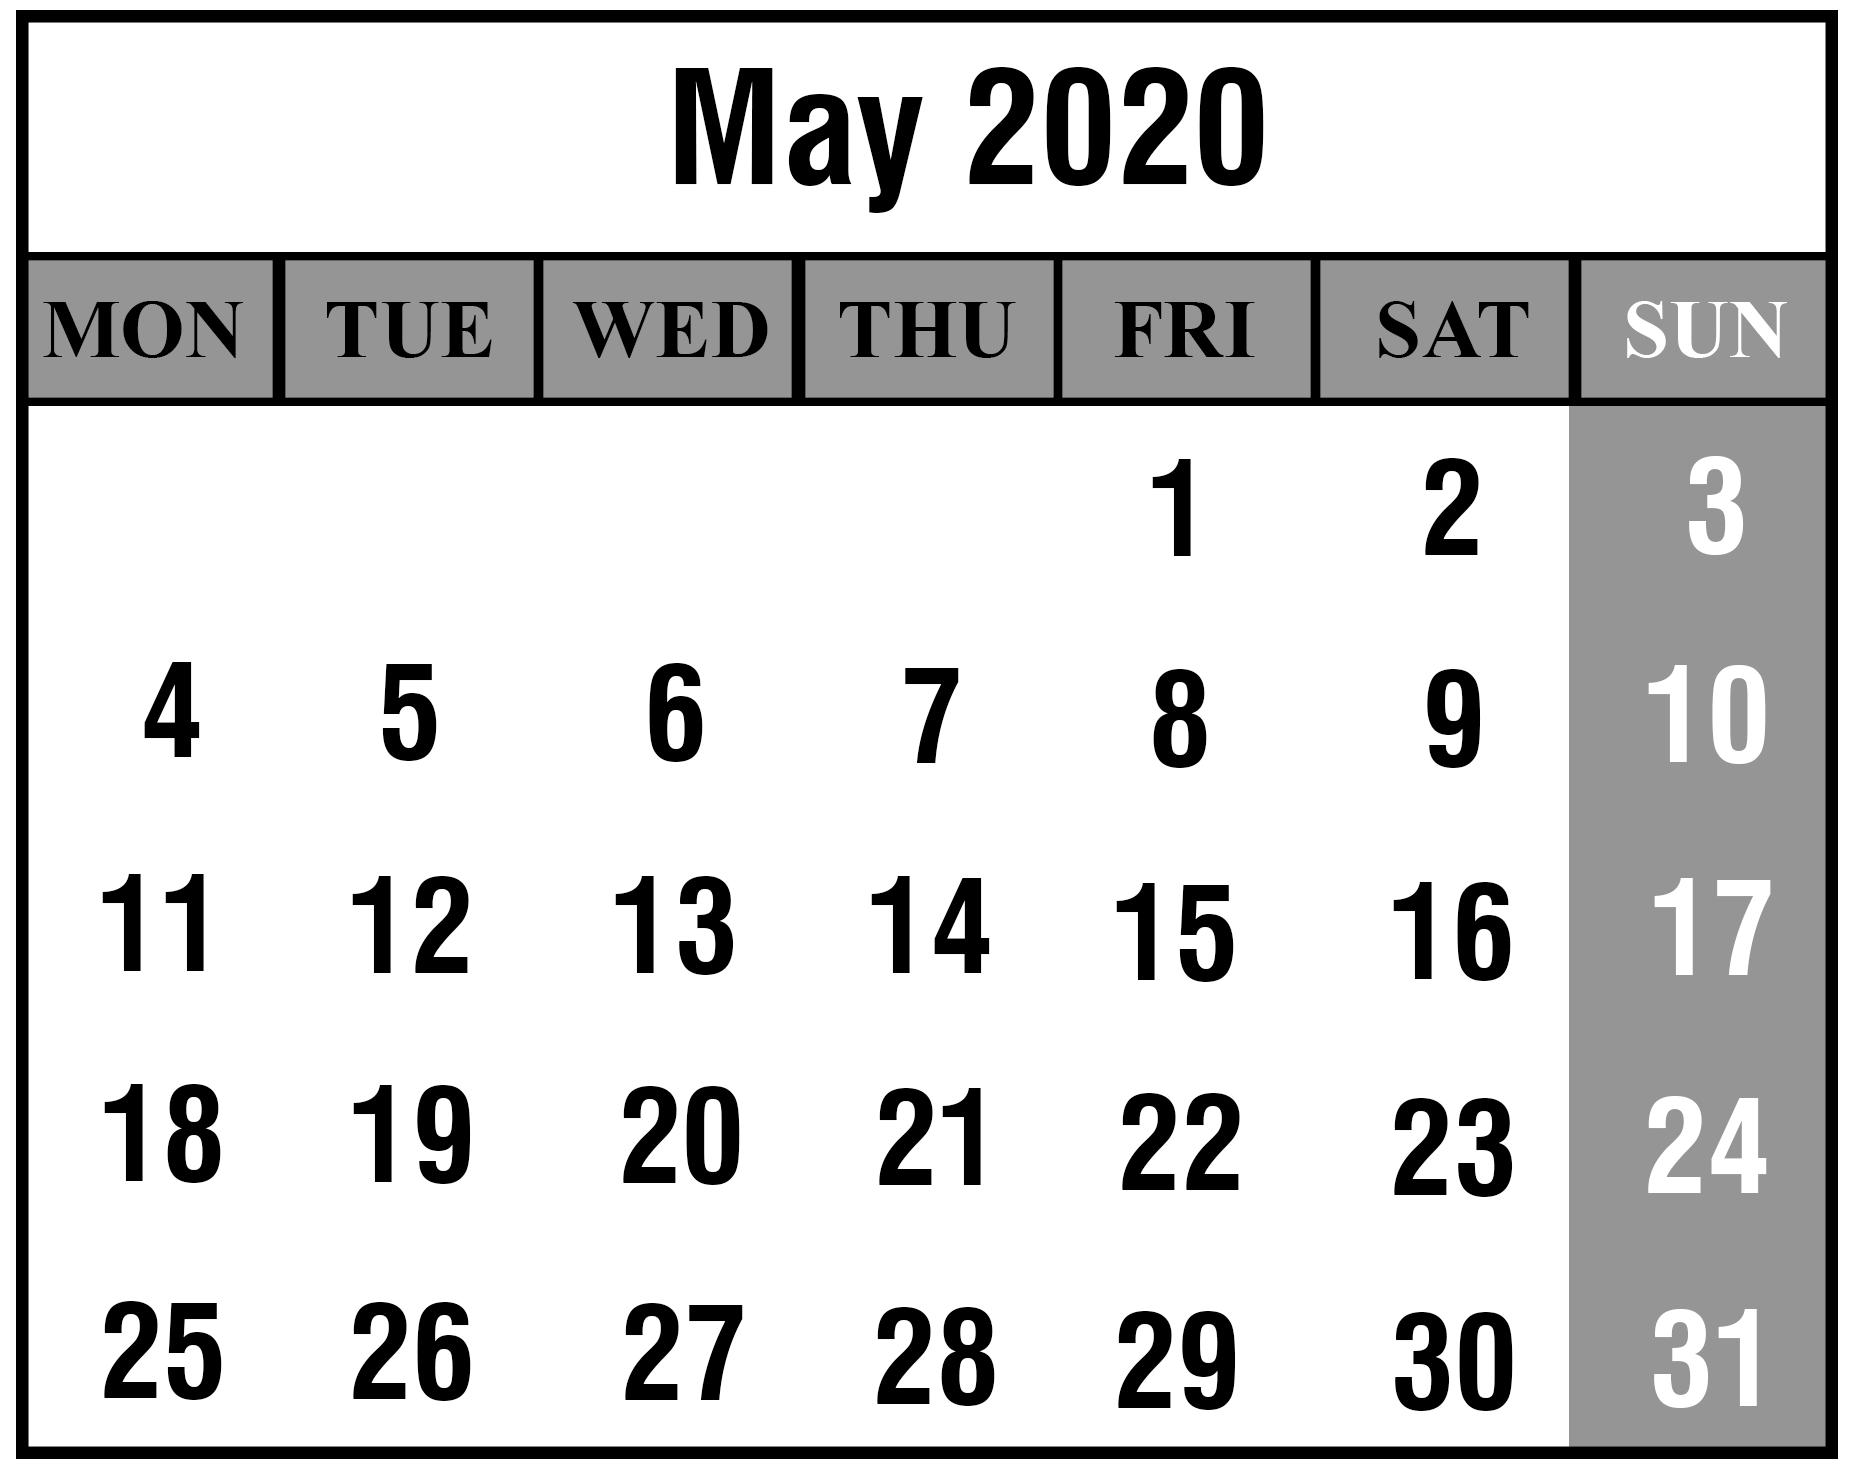 May 2020 Calendar PDF Template